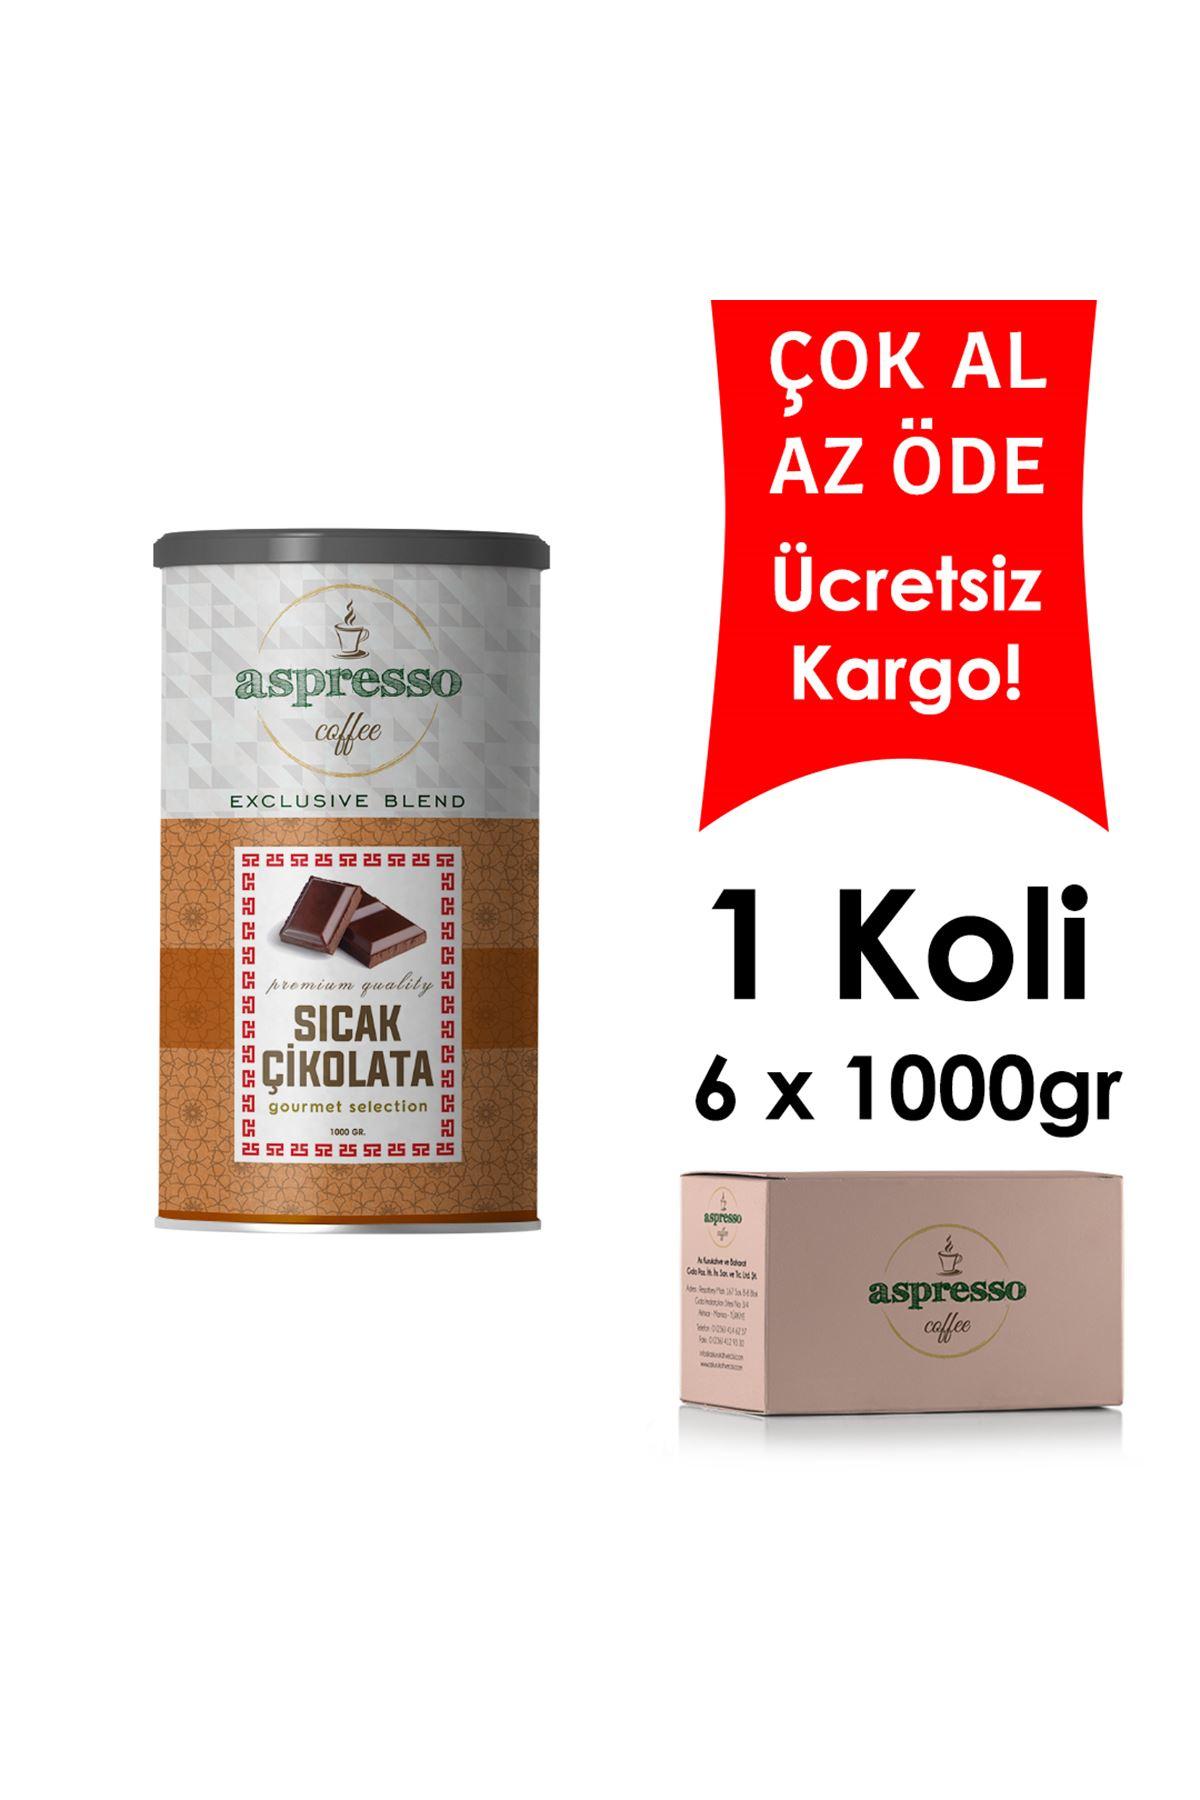 Sıcak Çikolata 1000 gr. x 6 Adet